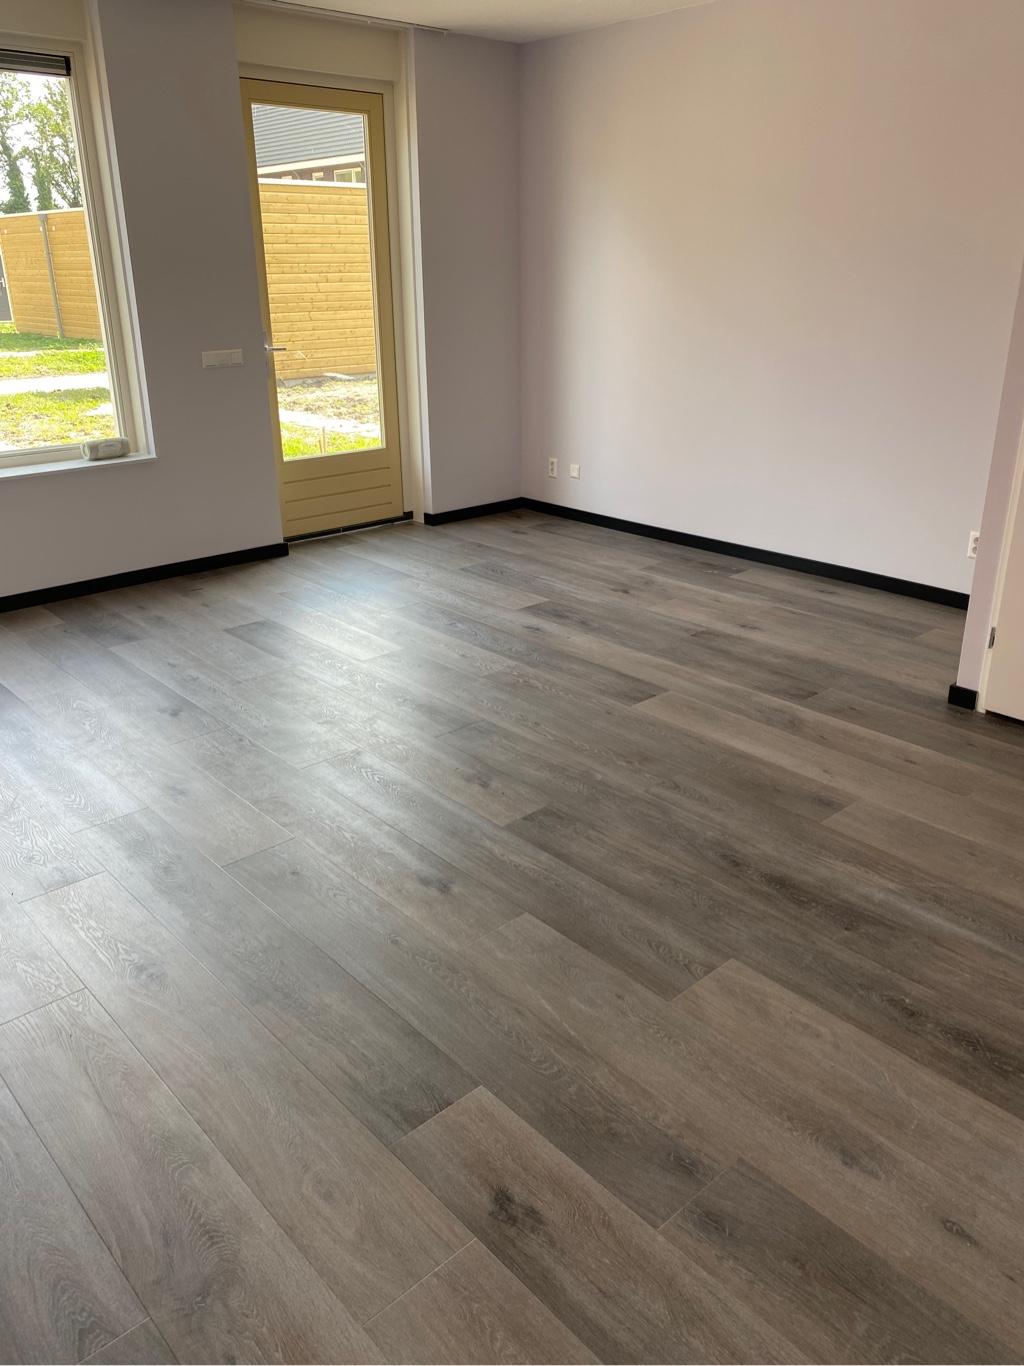 45 m² Riante Plank Nougat Plak-pvc te Nieuw-Lekkerland